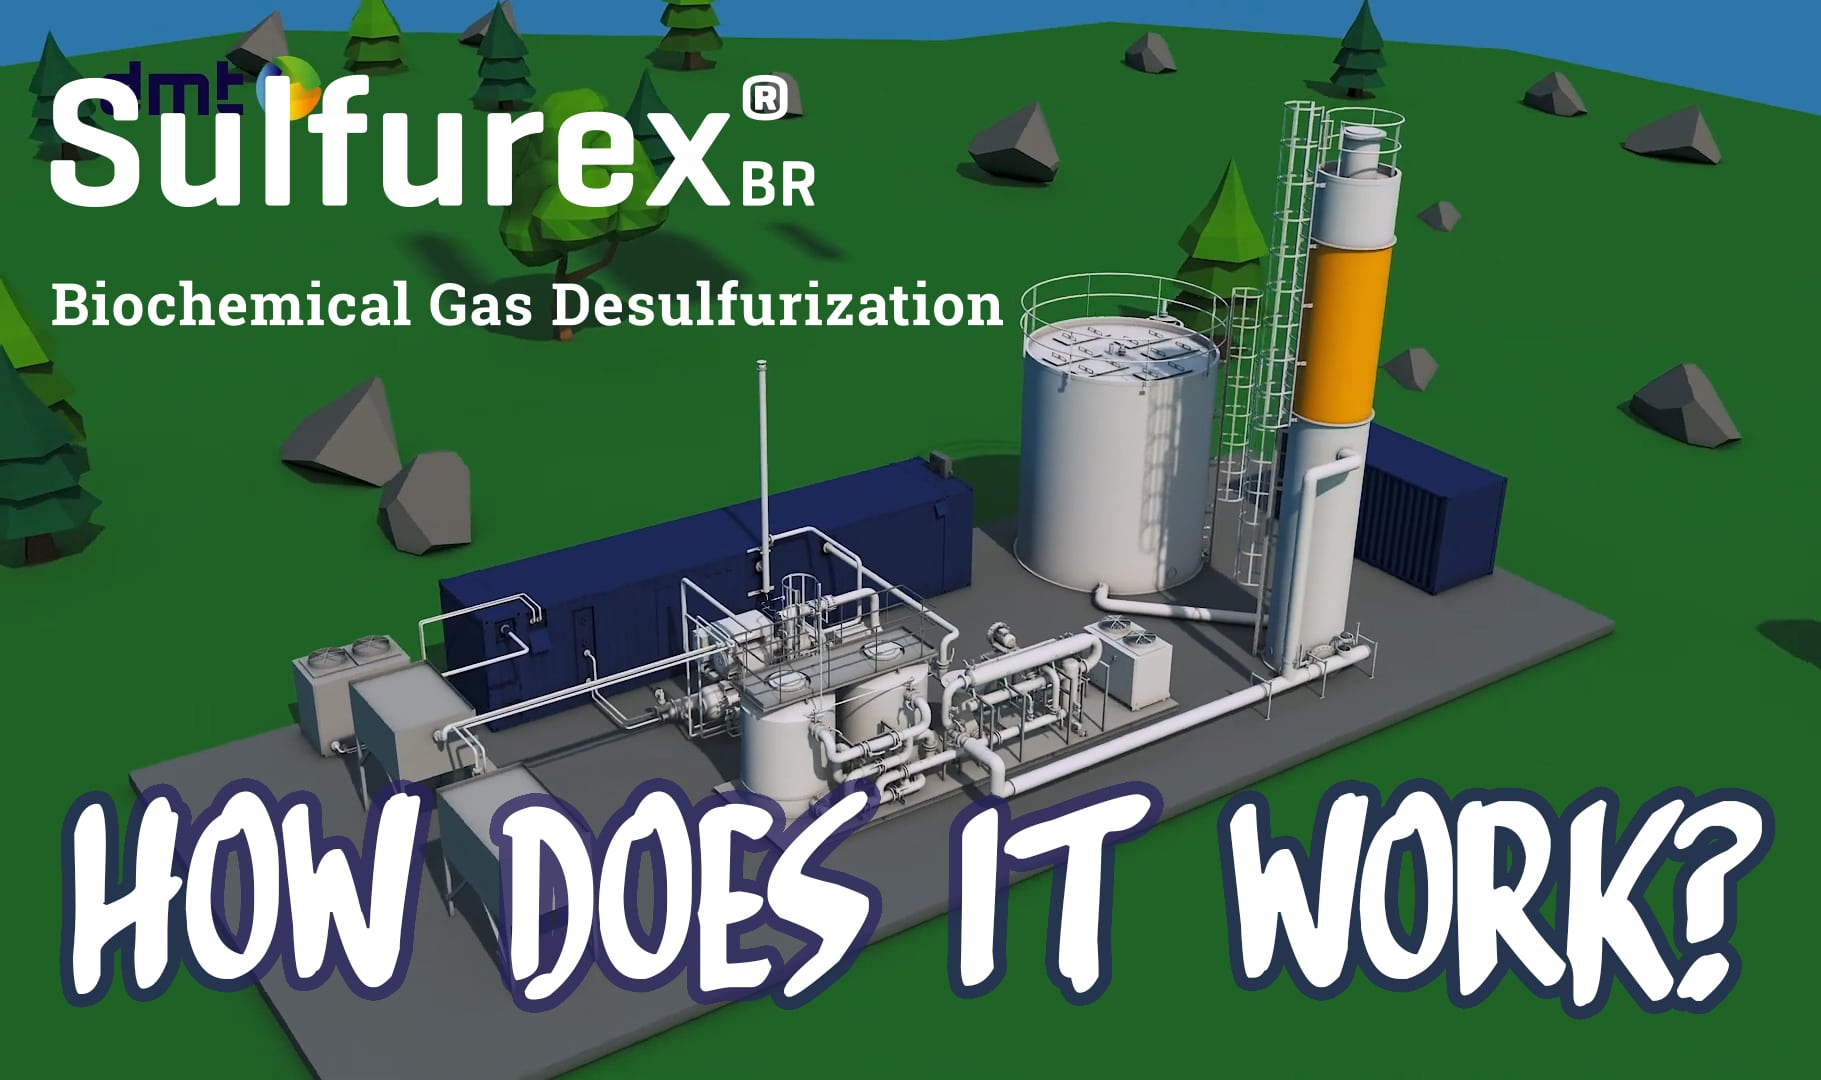 Choose the Sulfurex®BR.